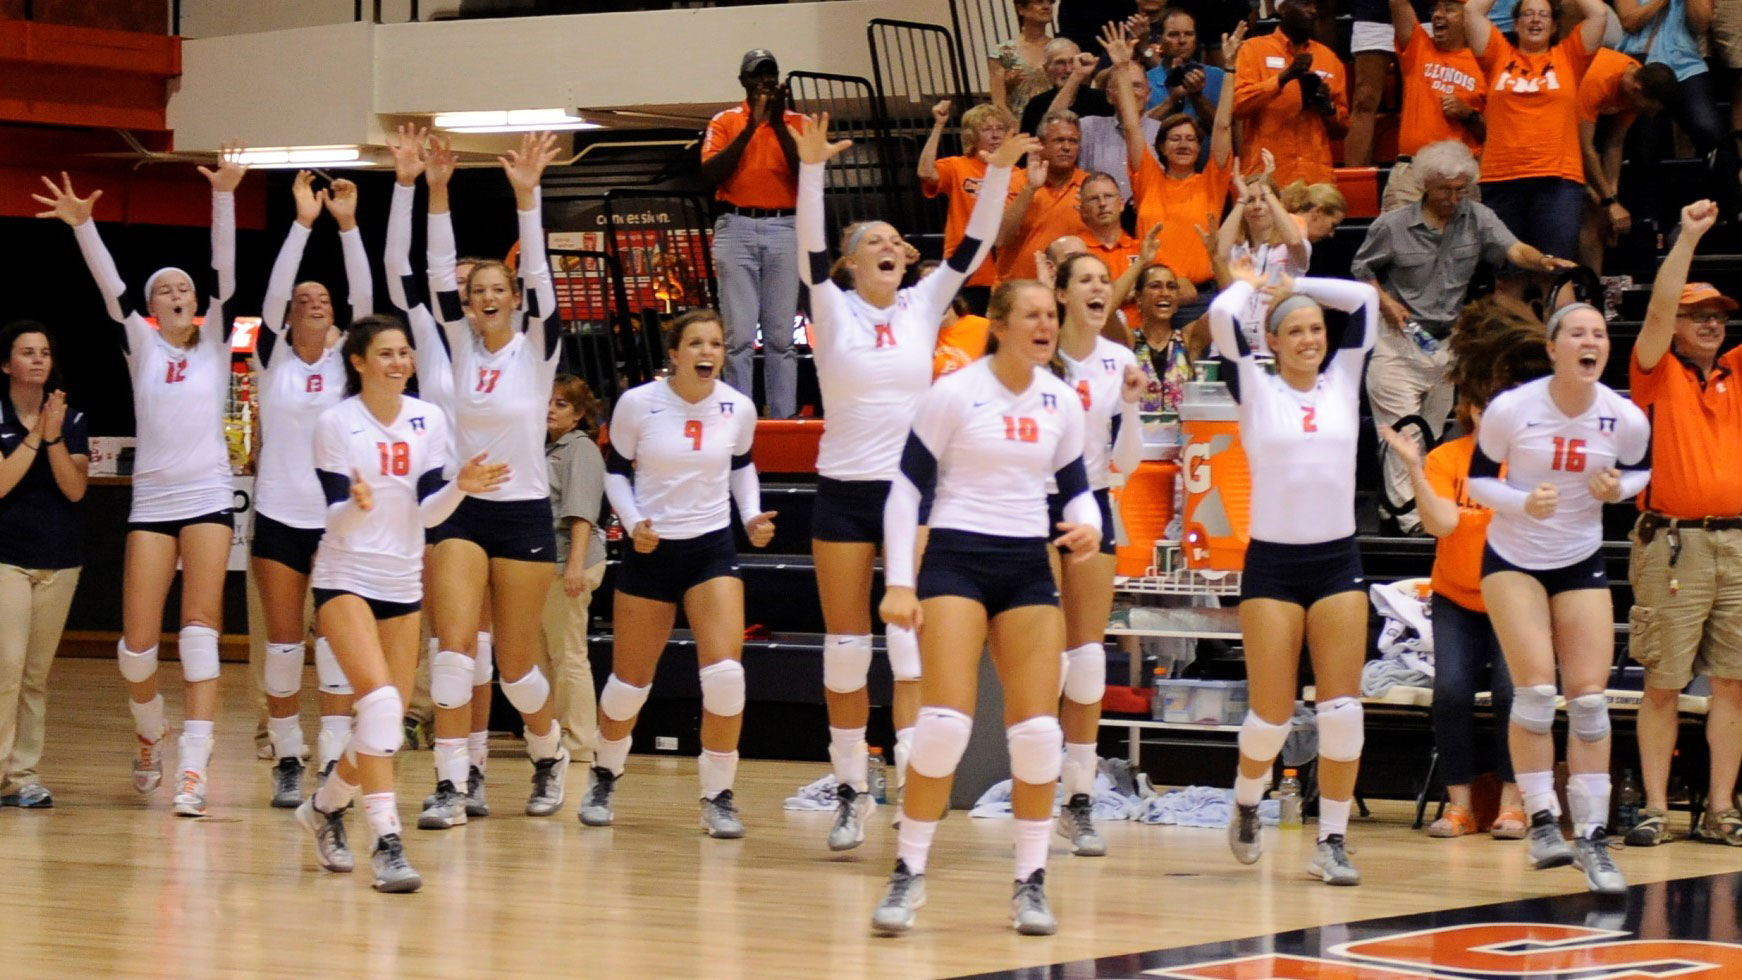 image of illini volleyball team celebrating a win